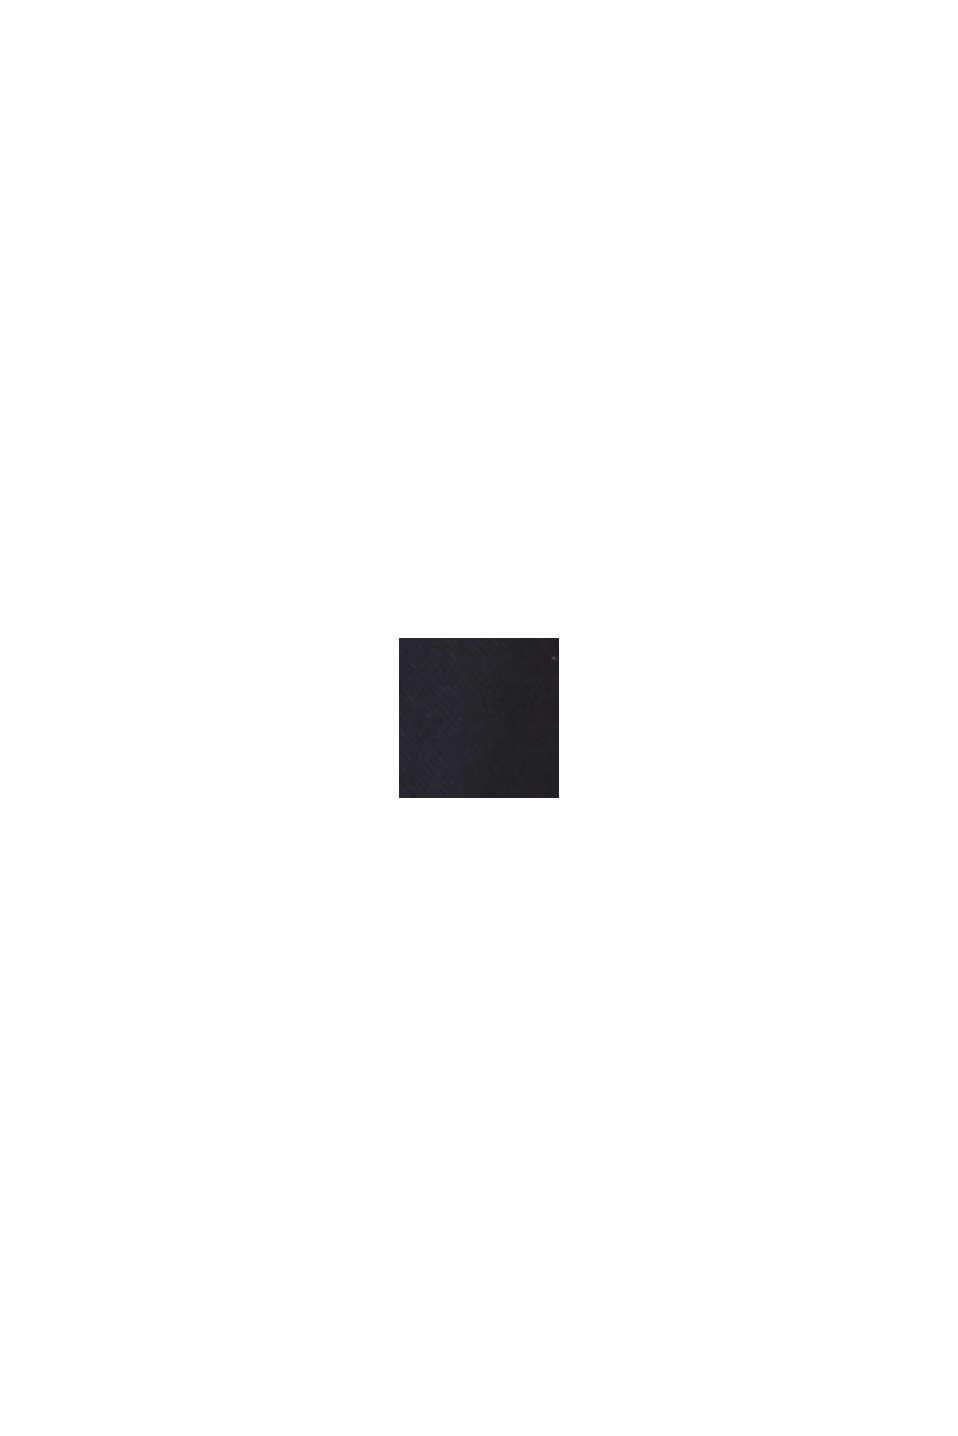 Nilkkapituiset sikarihousut, BLACK, swatch